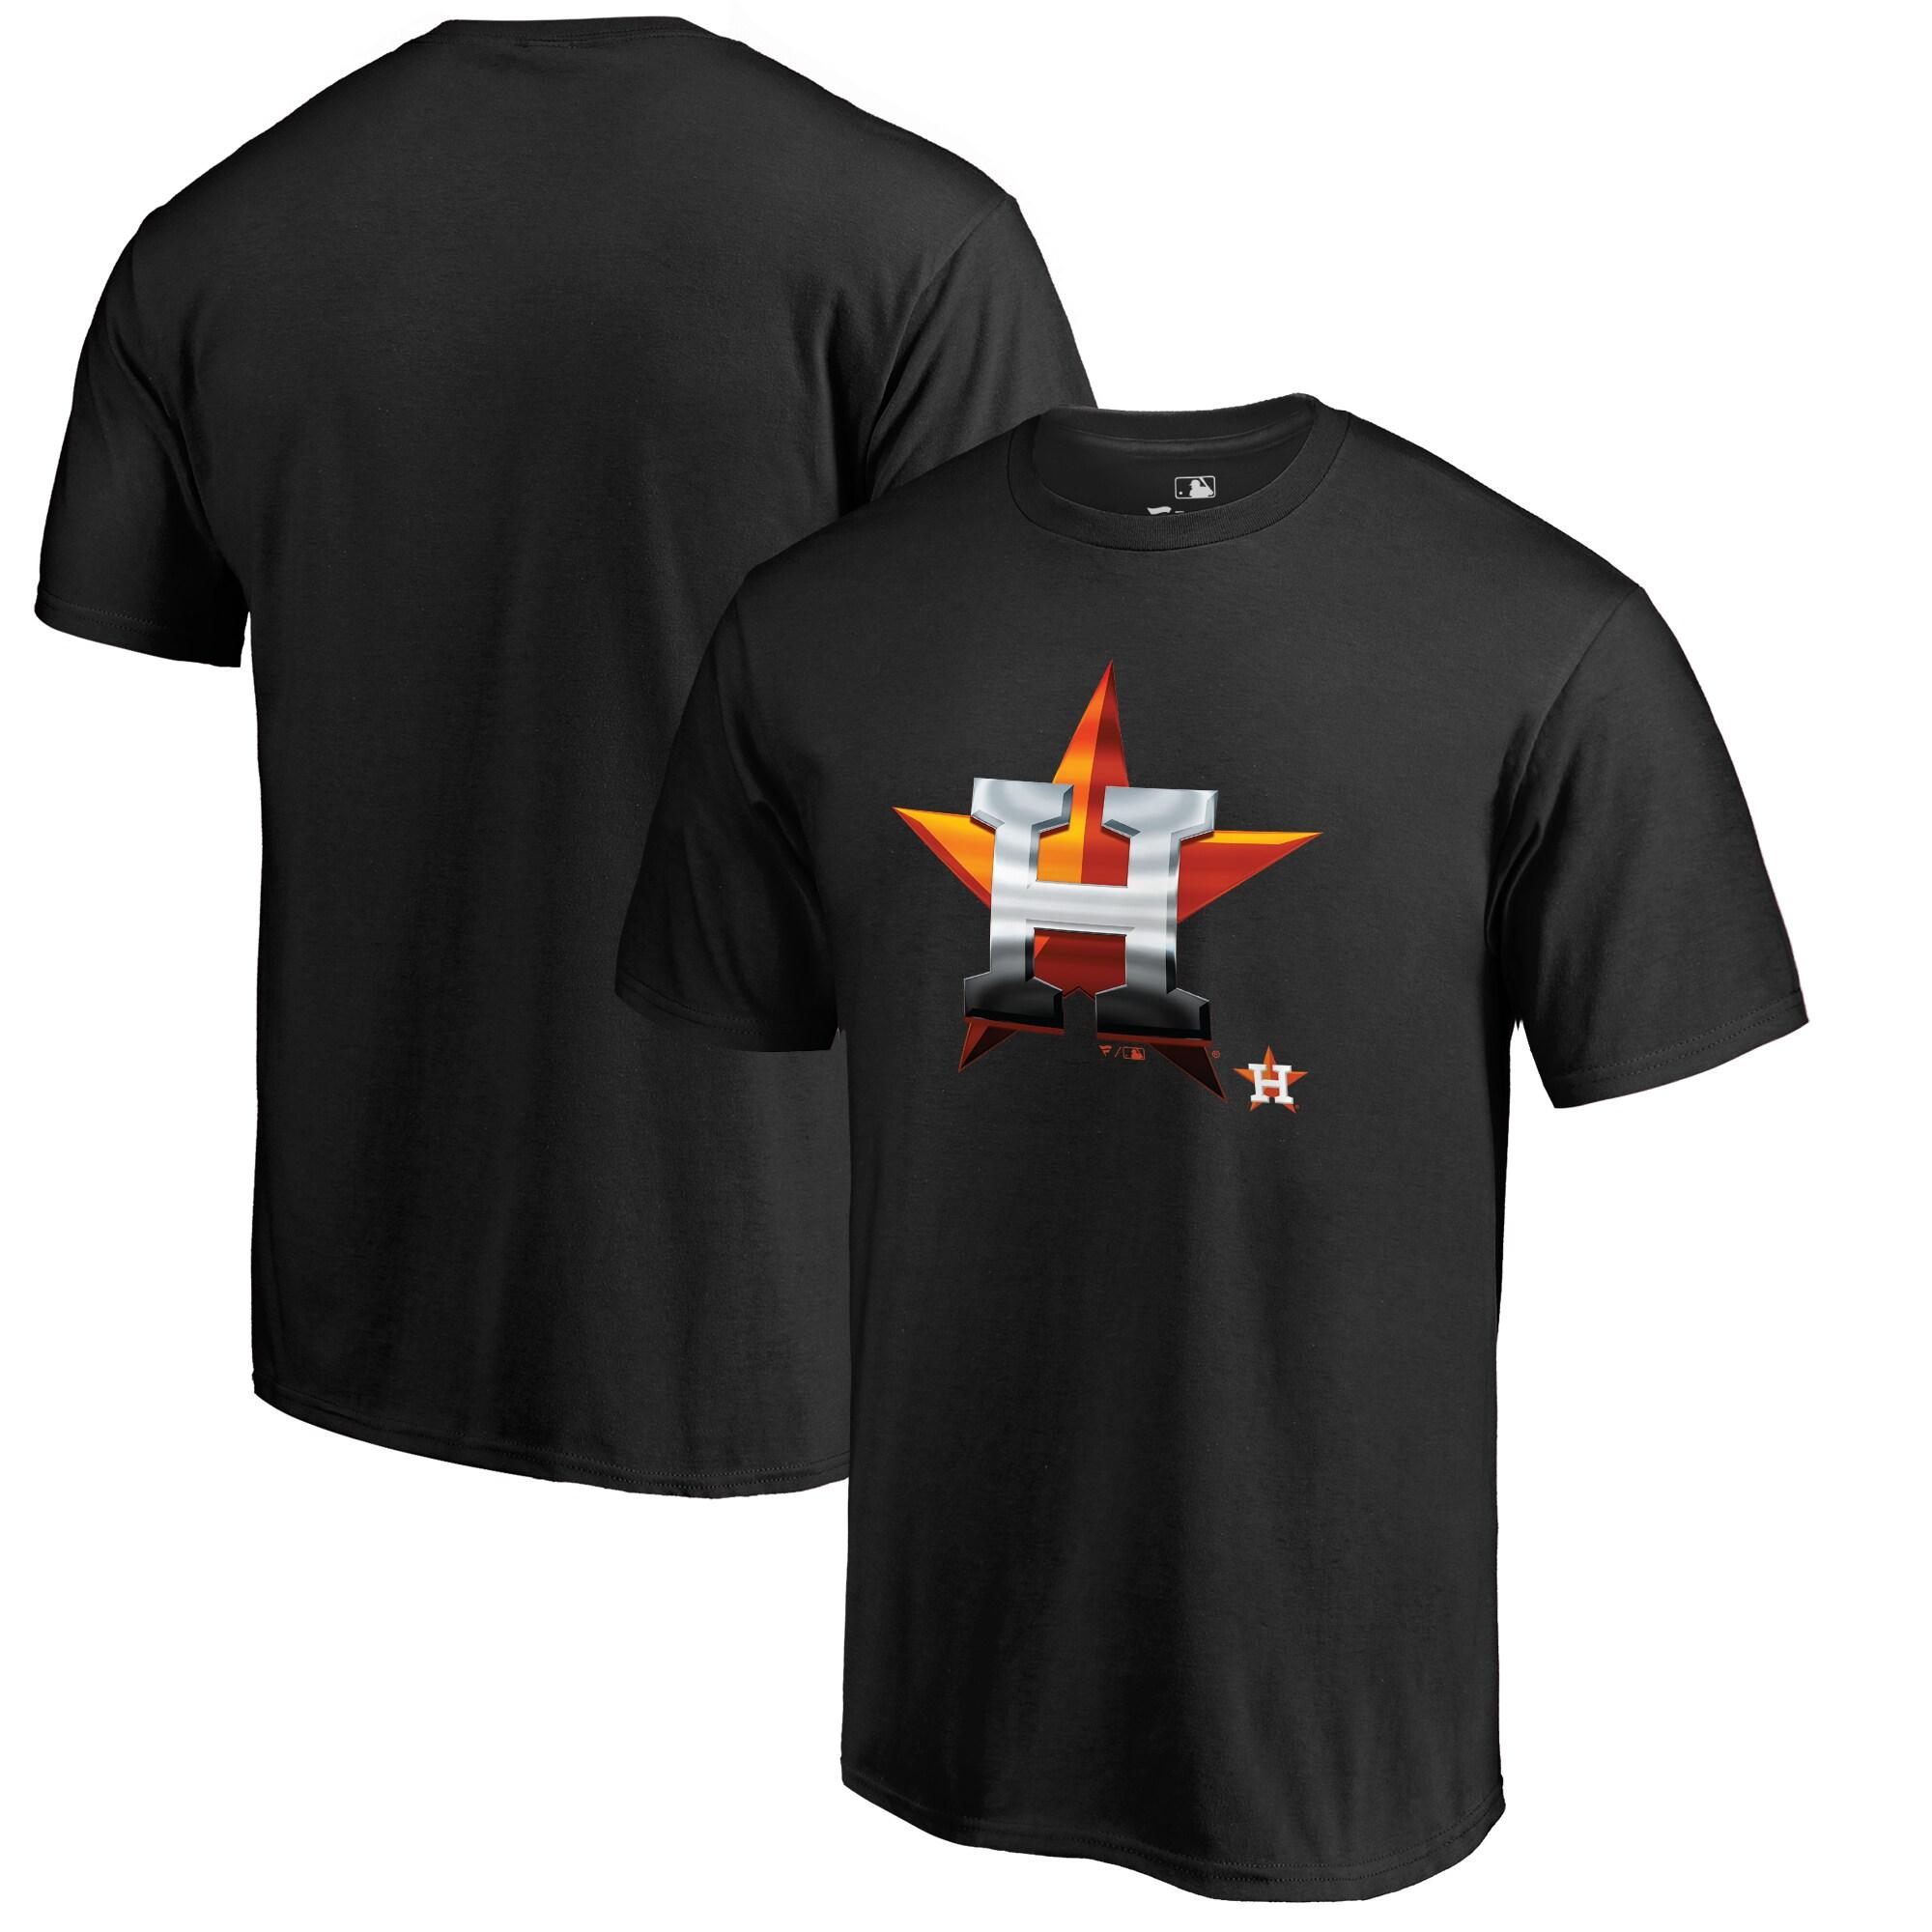 Houston Astros Fanatics Branded Midnight Mascot T-Shirt - Black